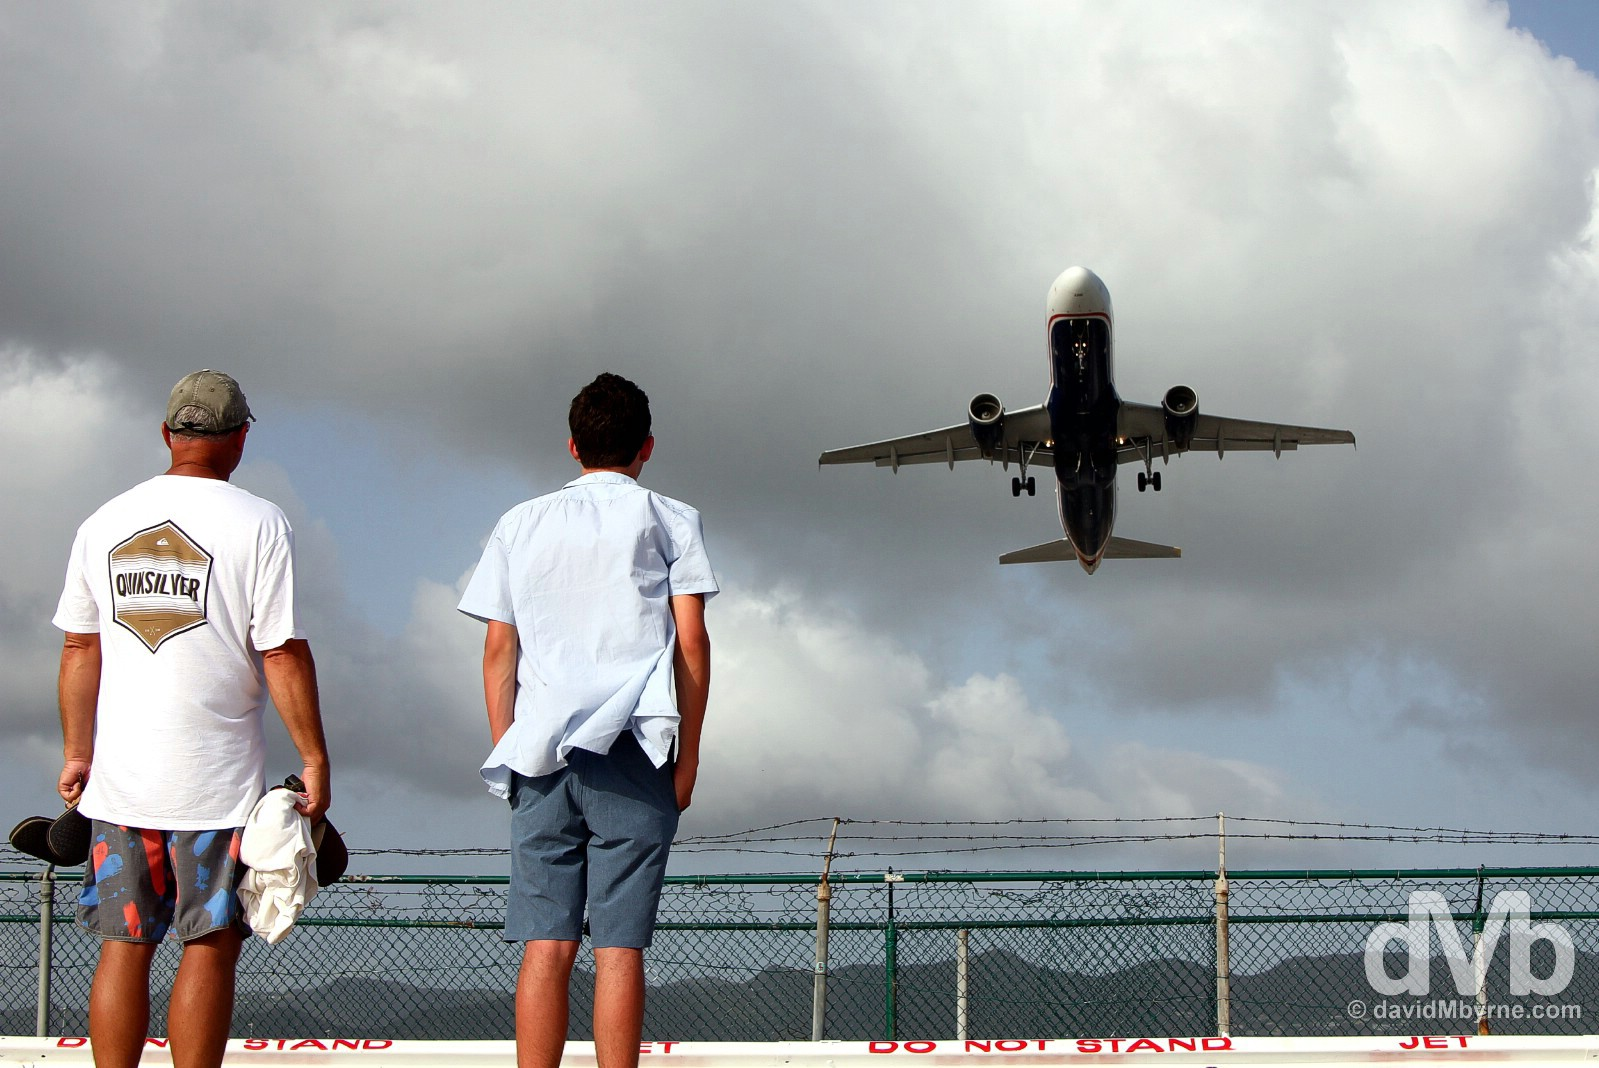 Take-off from Juliana Airport as viewed from Maho Beach, Sint Maarten, Lesser Antilles. June 7, 2015.